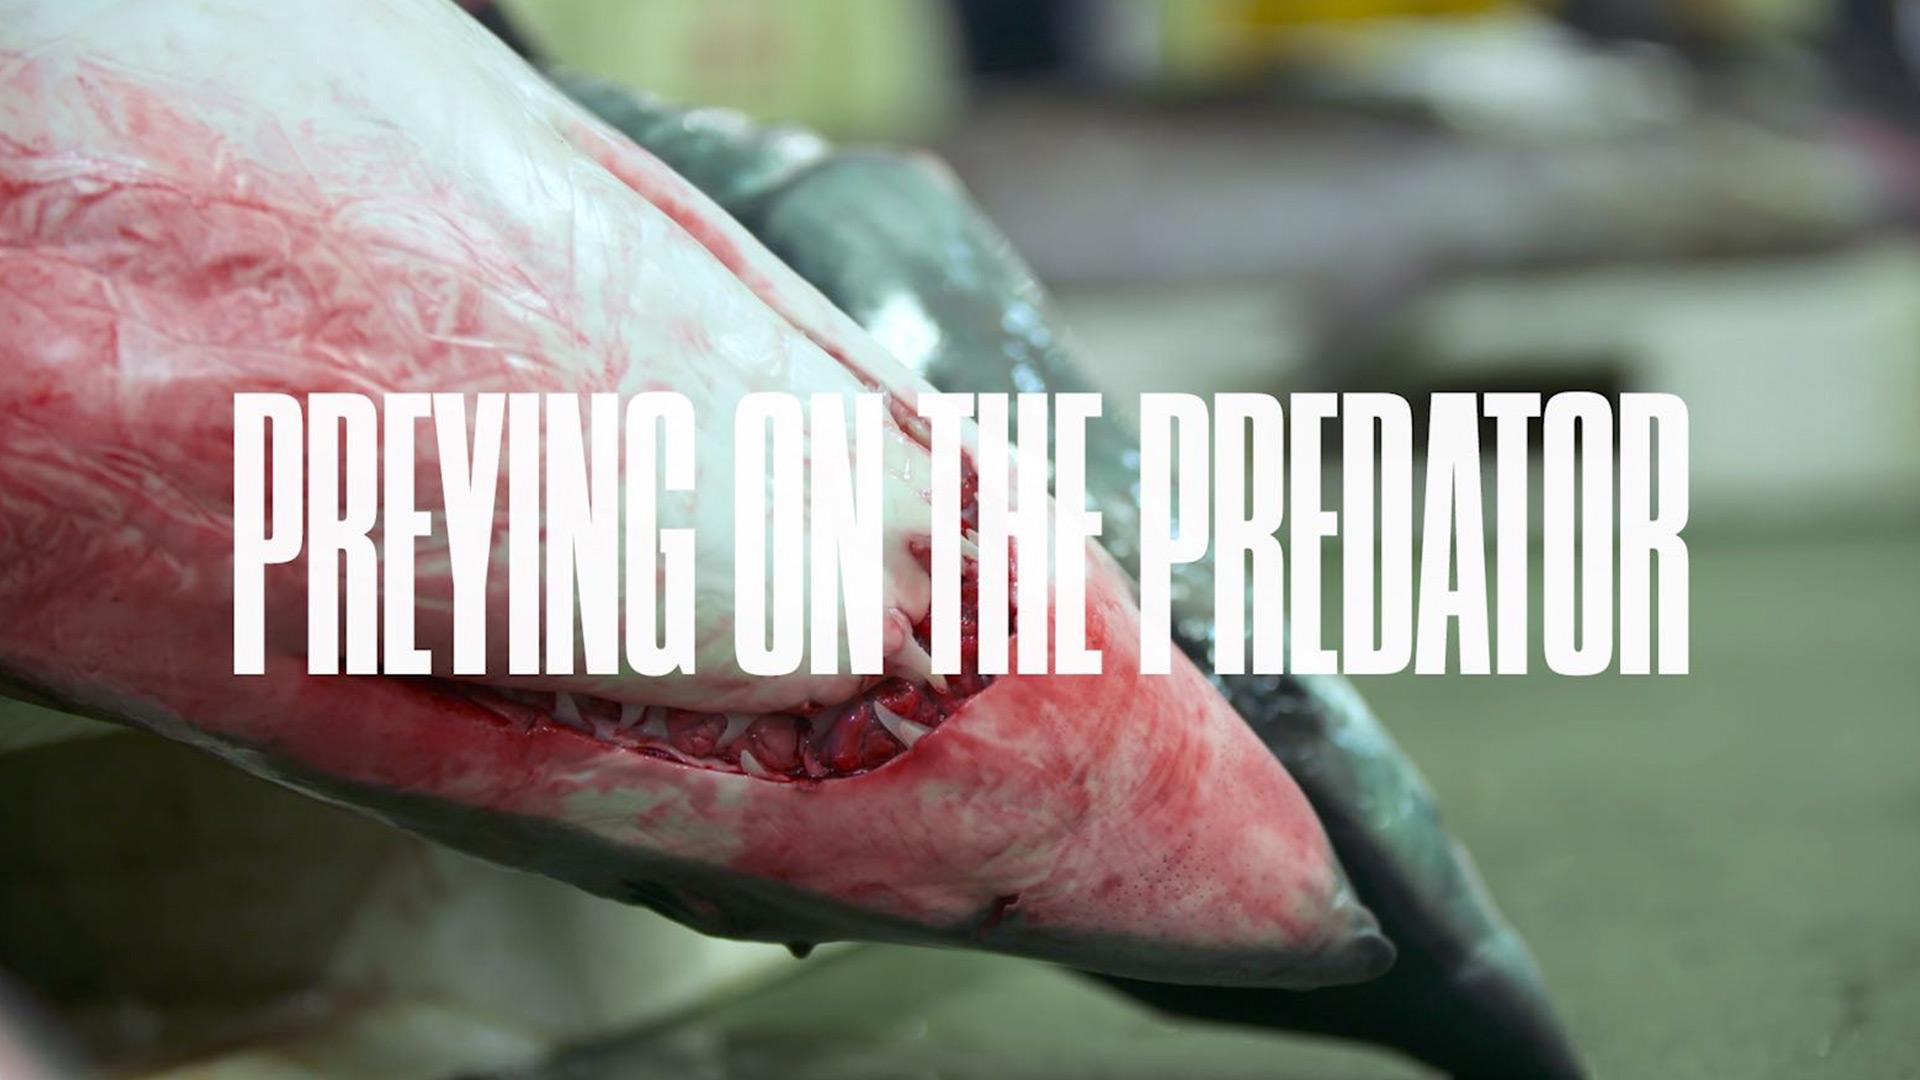 galeria-01-preying-on-the-predator